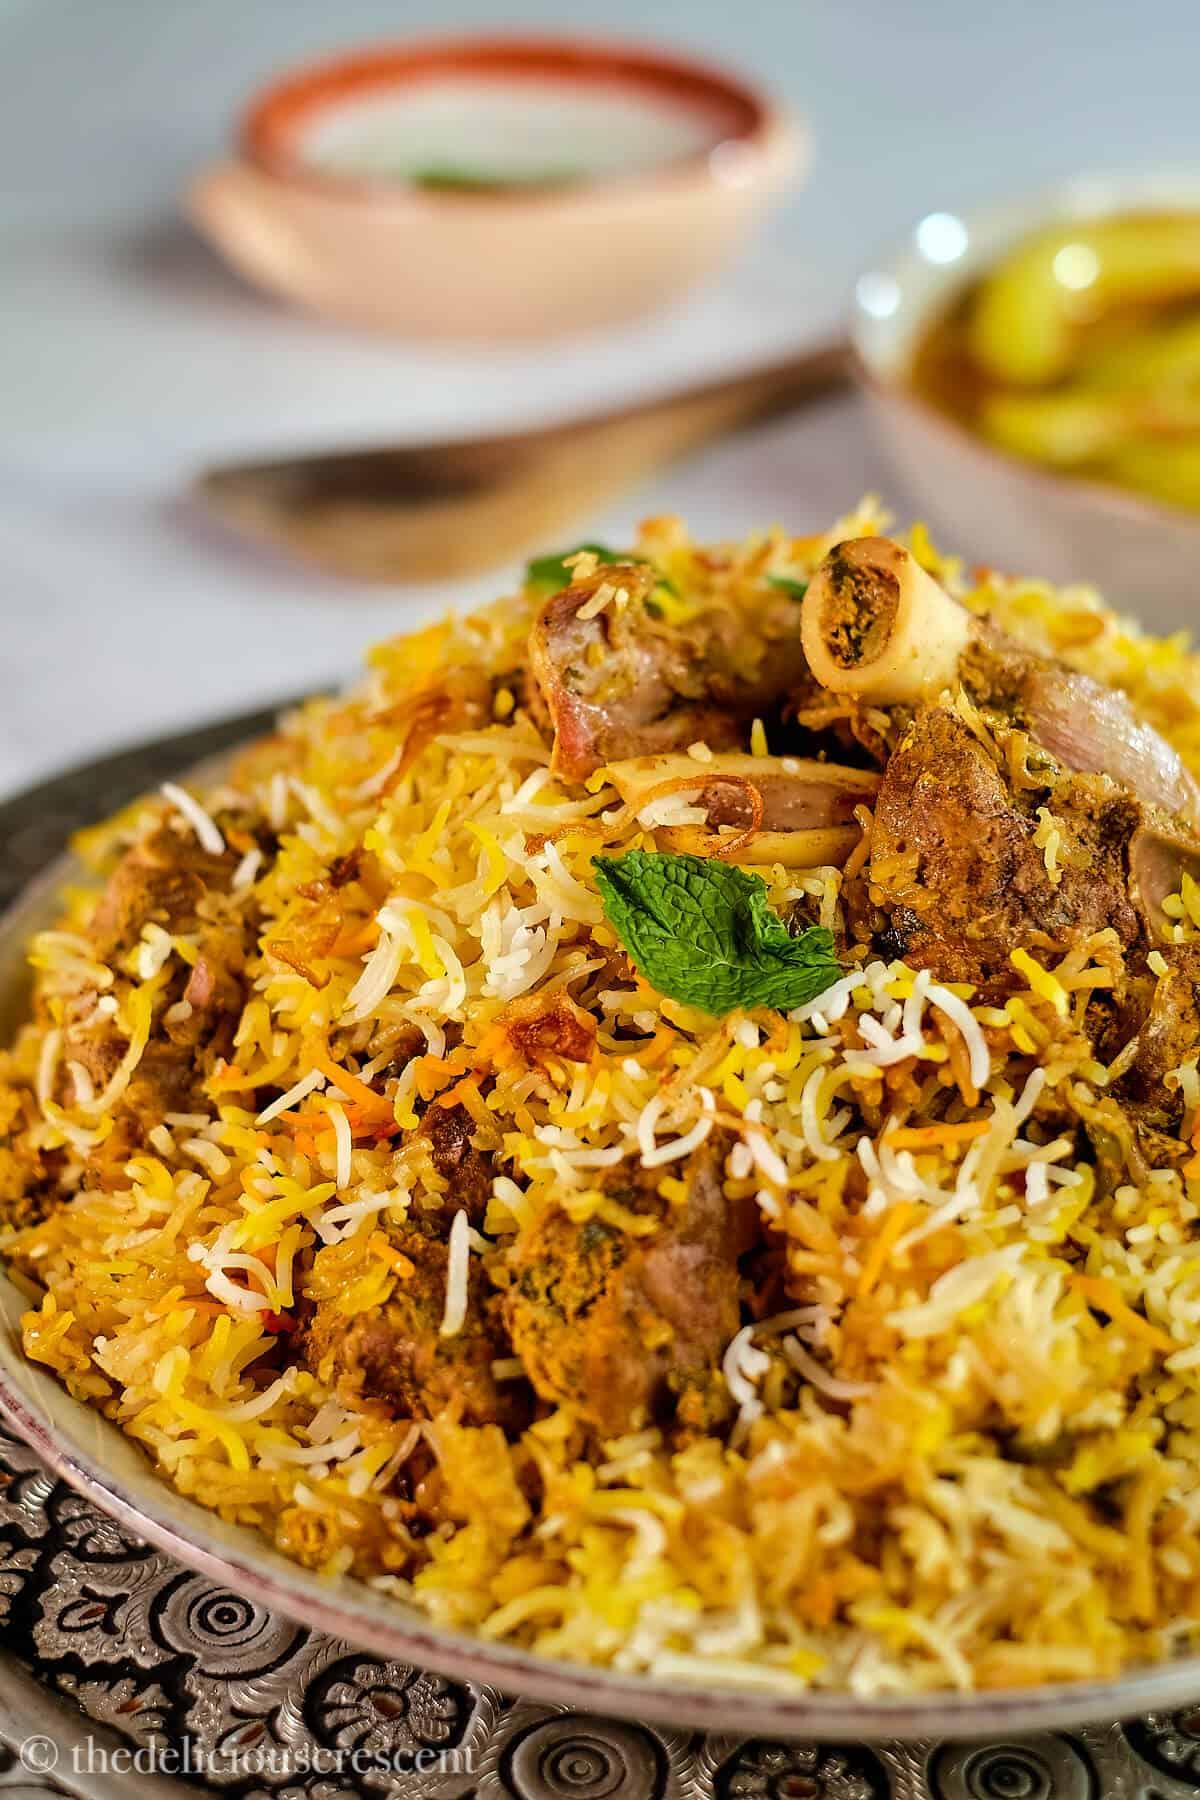 Hyderabadi lamb biryani served in a plate.